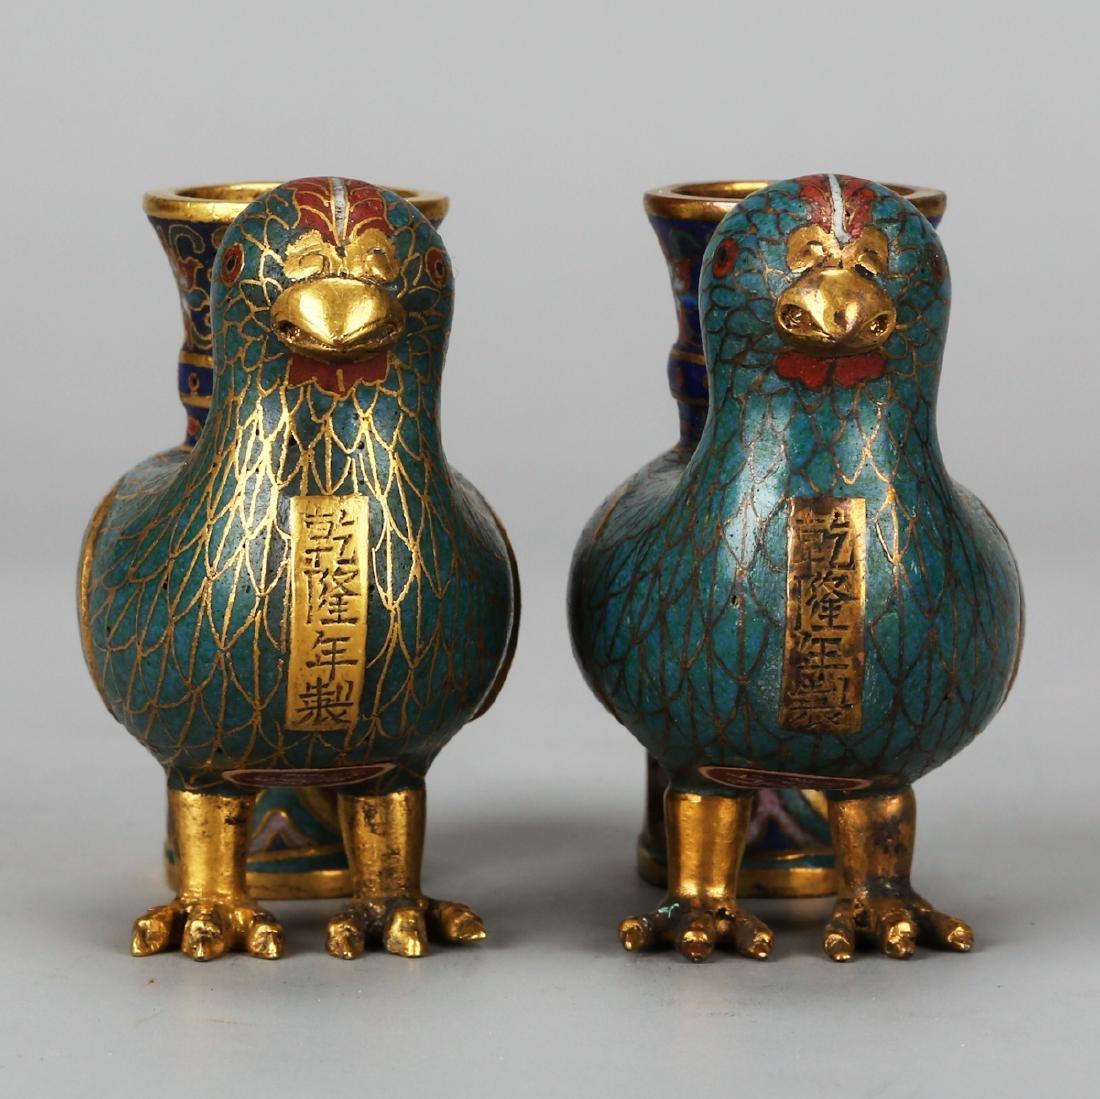 CHINESE CLOISONNE BIRD VASES, PAIR - 3